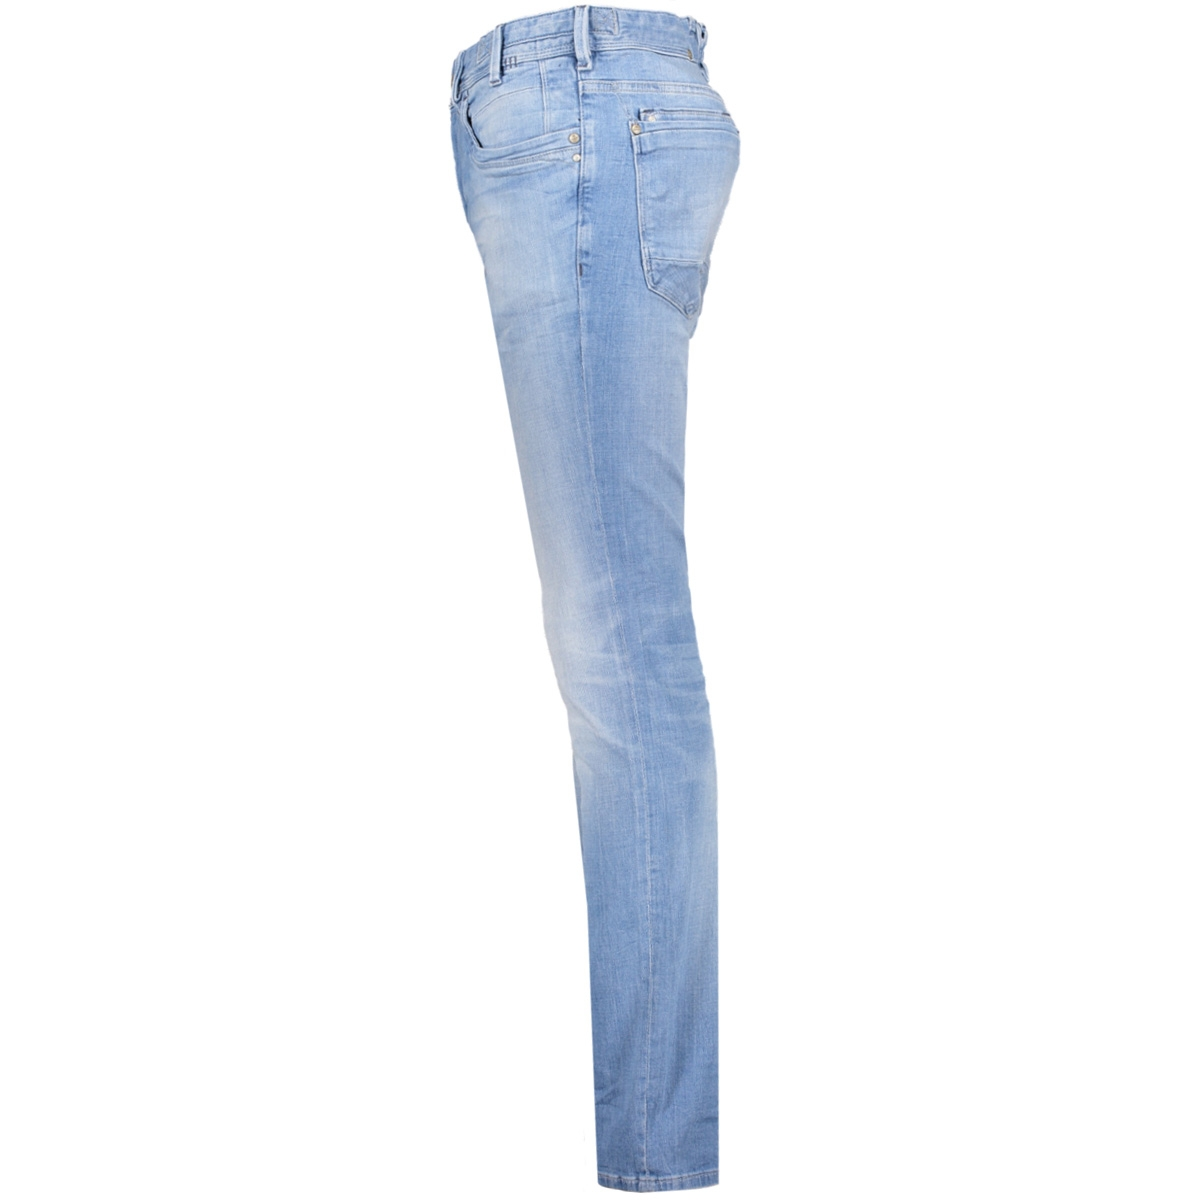 vtr525-leb vanguard jeans leb